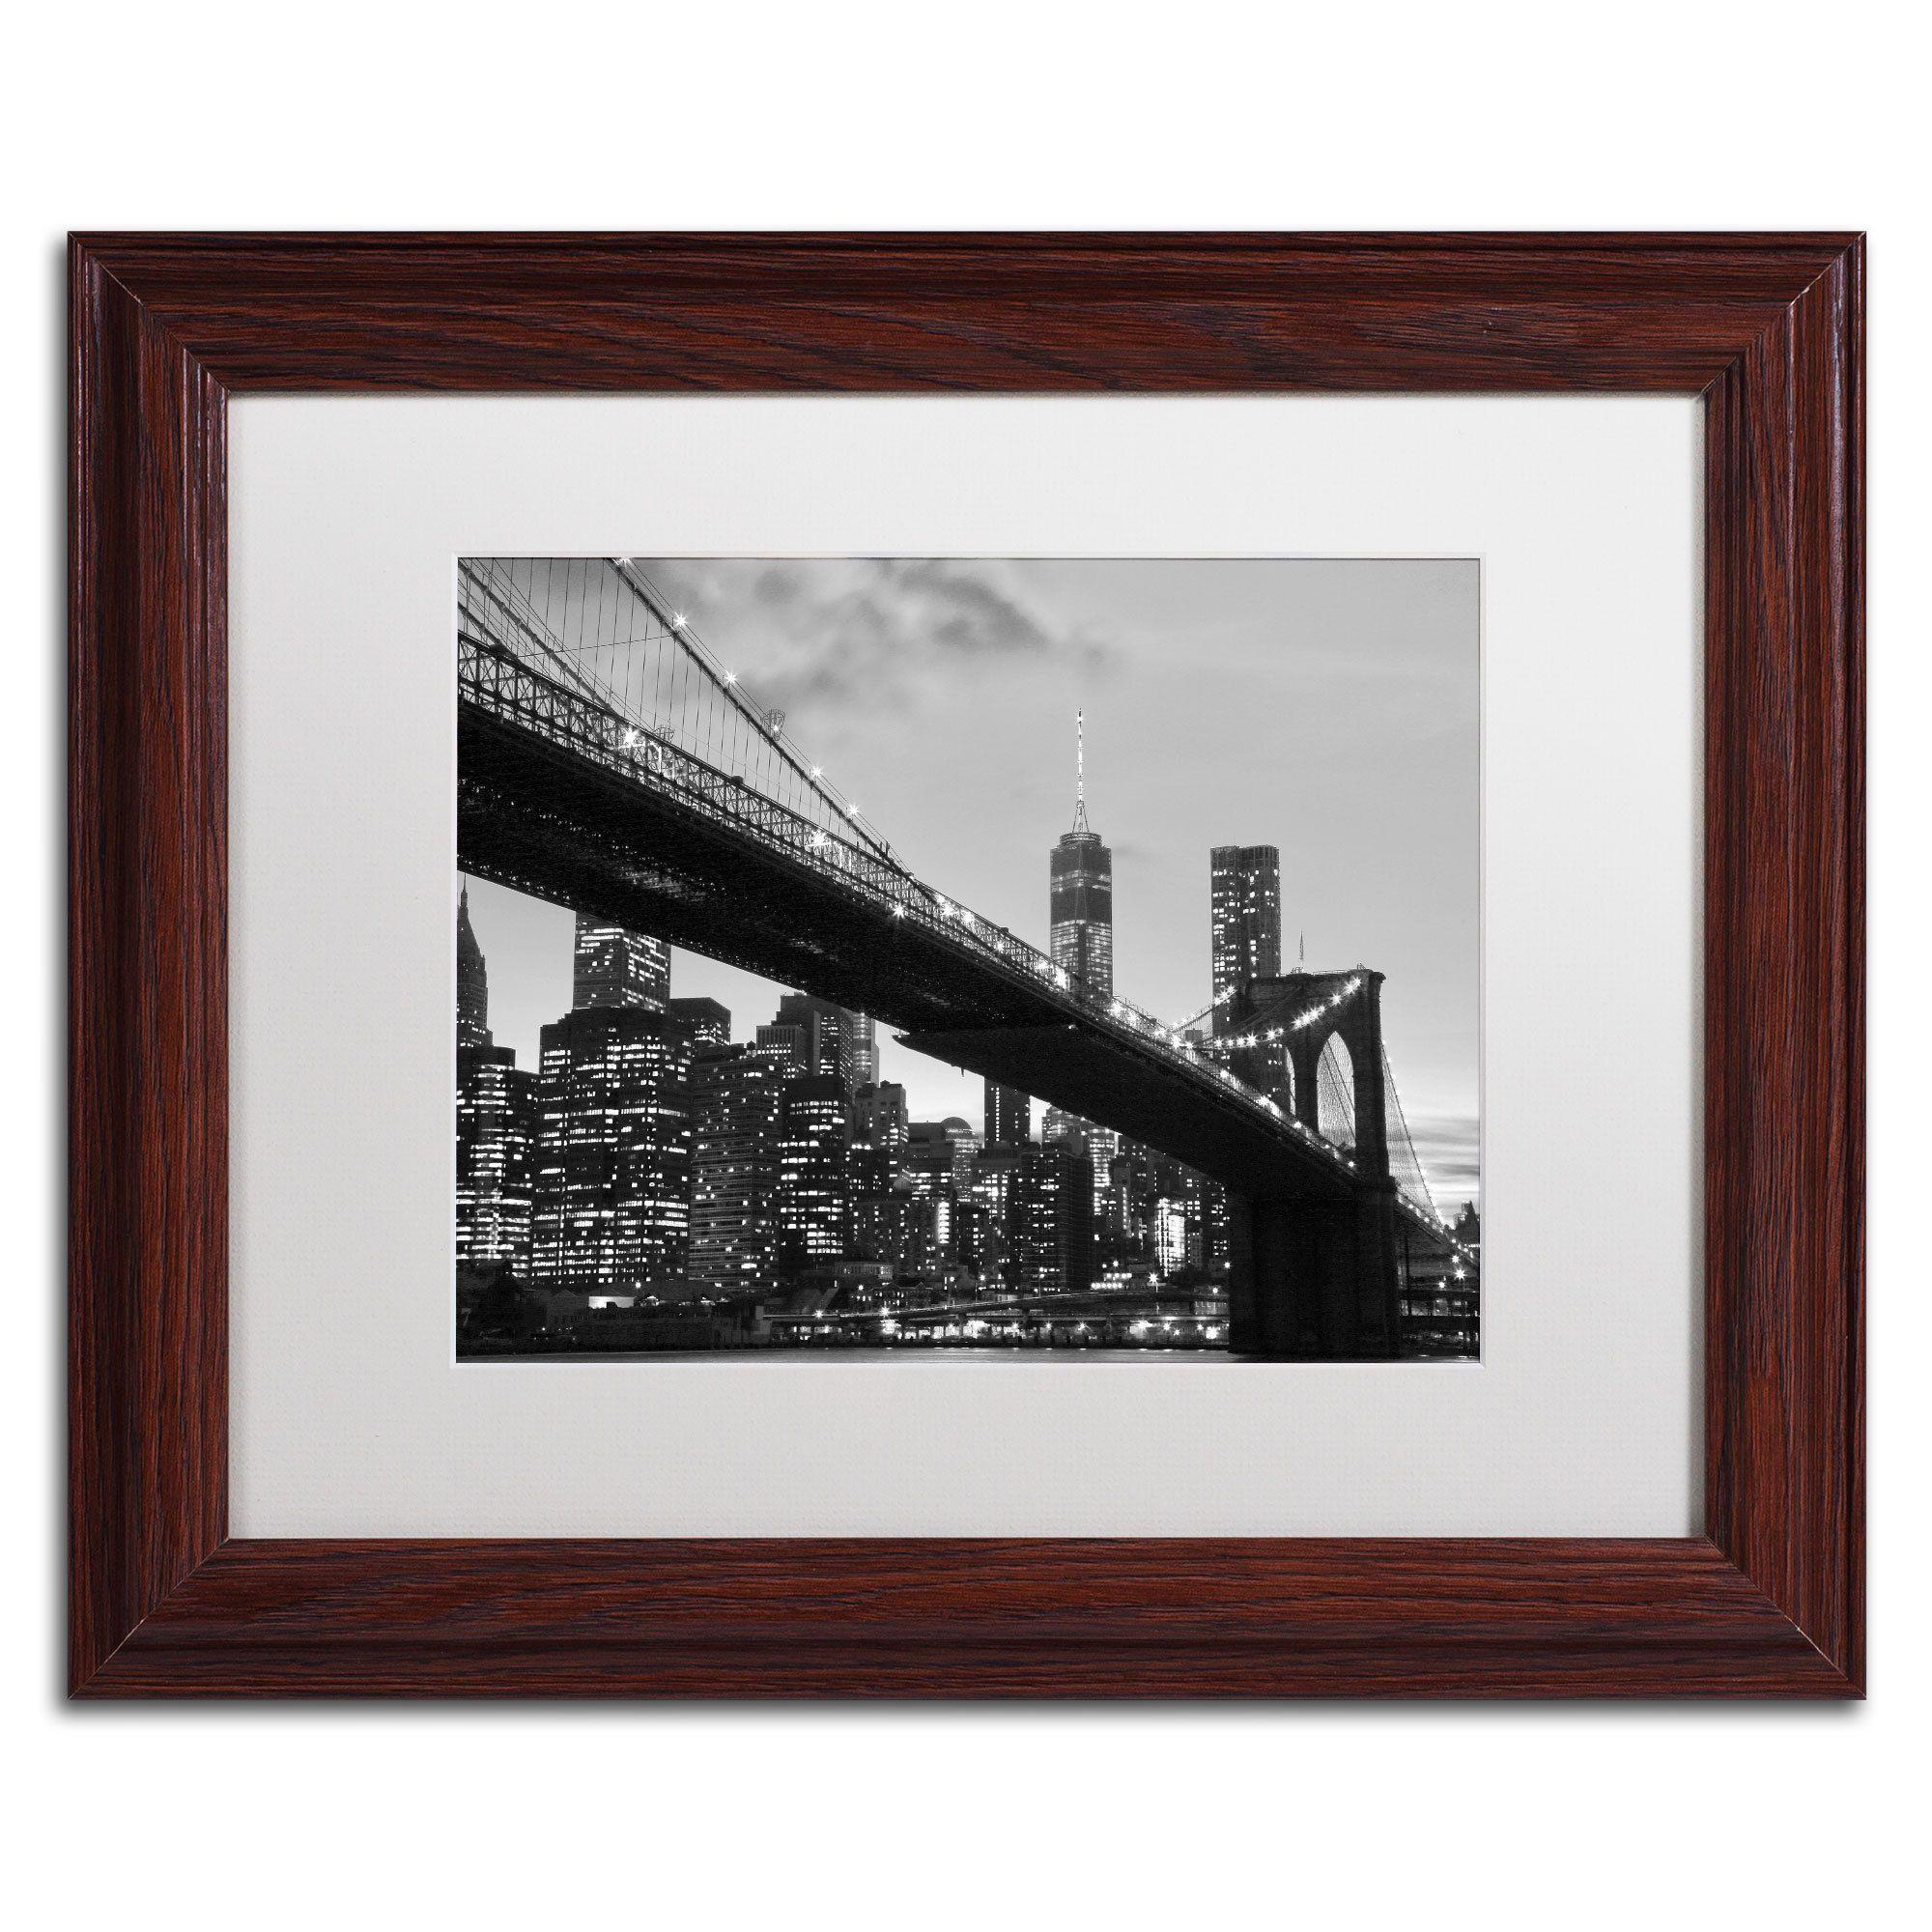 Cateyes Brooklyn Bridge 5 Matte, Wood Framed Wall Art